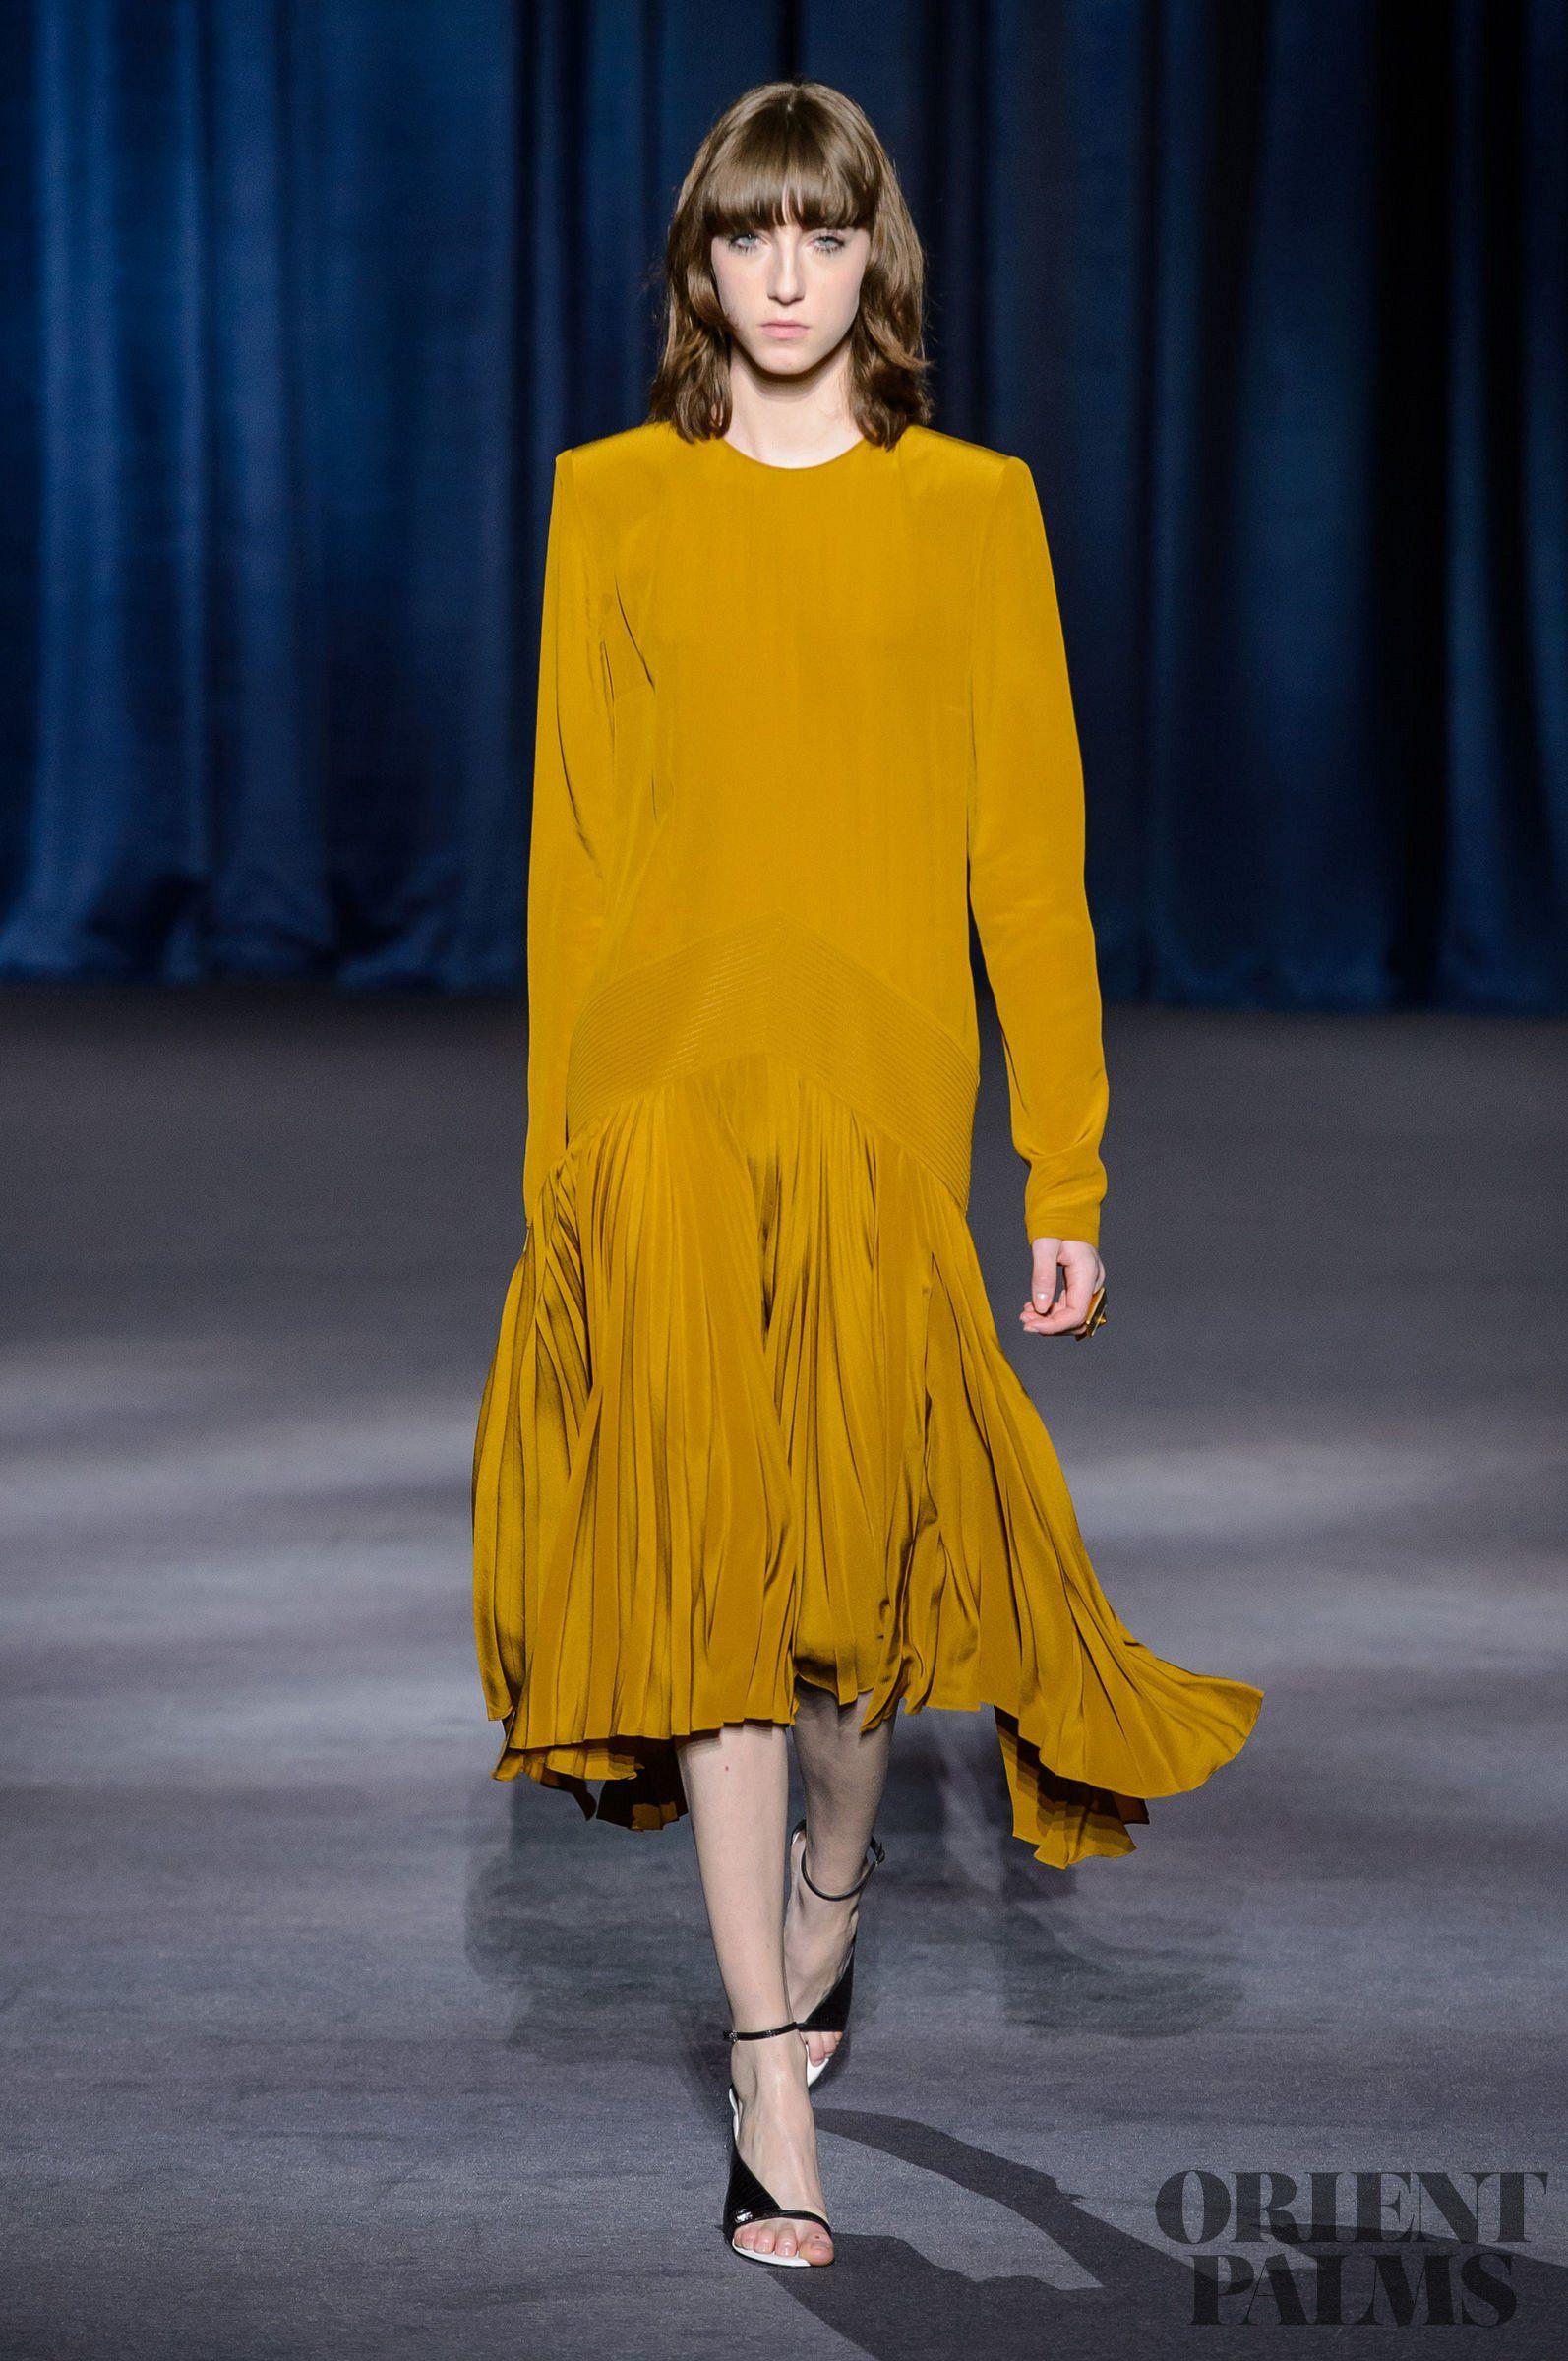 İlkbahar yaz 2019 Moda trendi 1970 ler